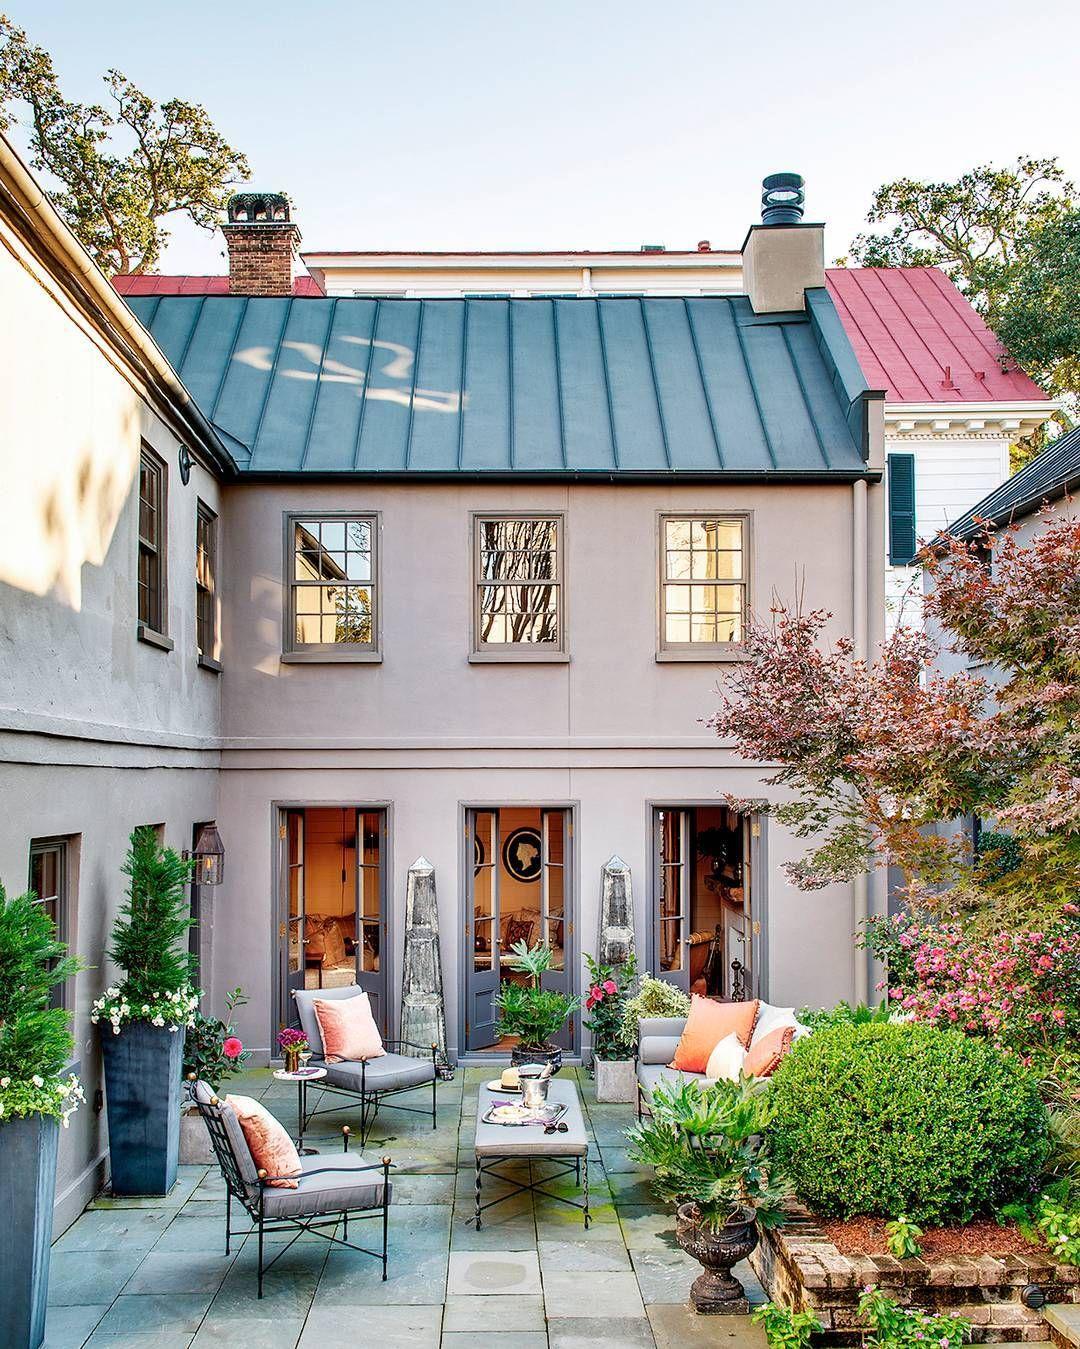 House Beautiful Housebeautiful V Instagram Courtyard Goals Trevortondro Design Cameronstewartdesign Outdoorliving Insta Arkitektur Hus Utendors